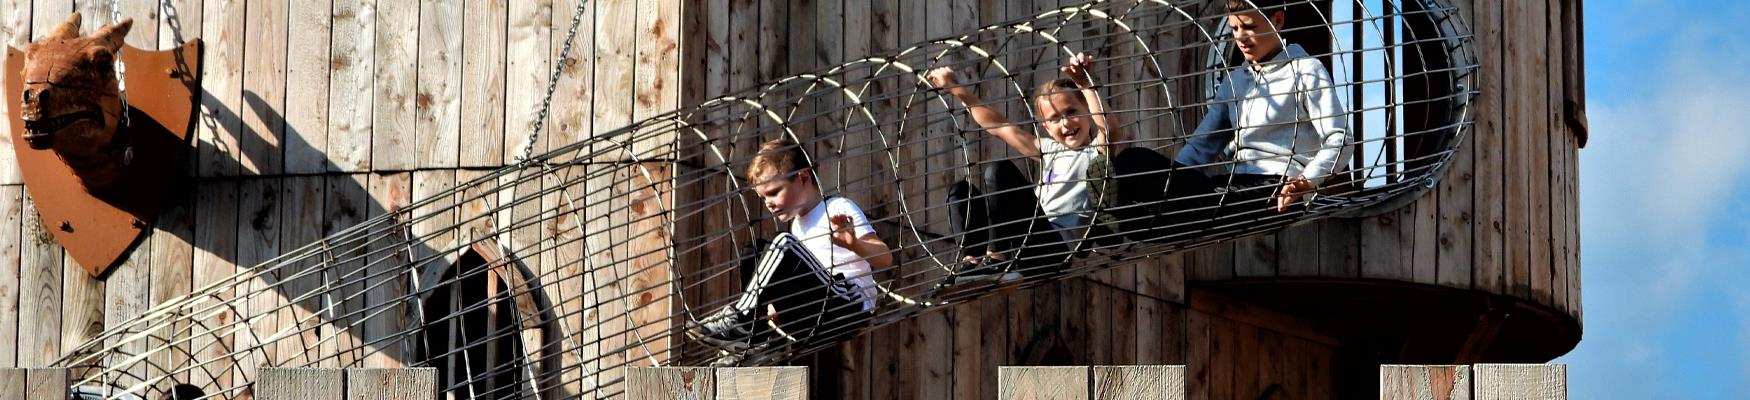 Children climbing through a metal tunnel at Knockhatch Adventure Park